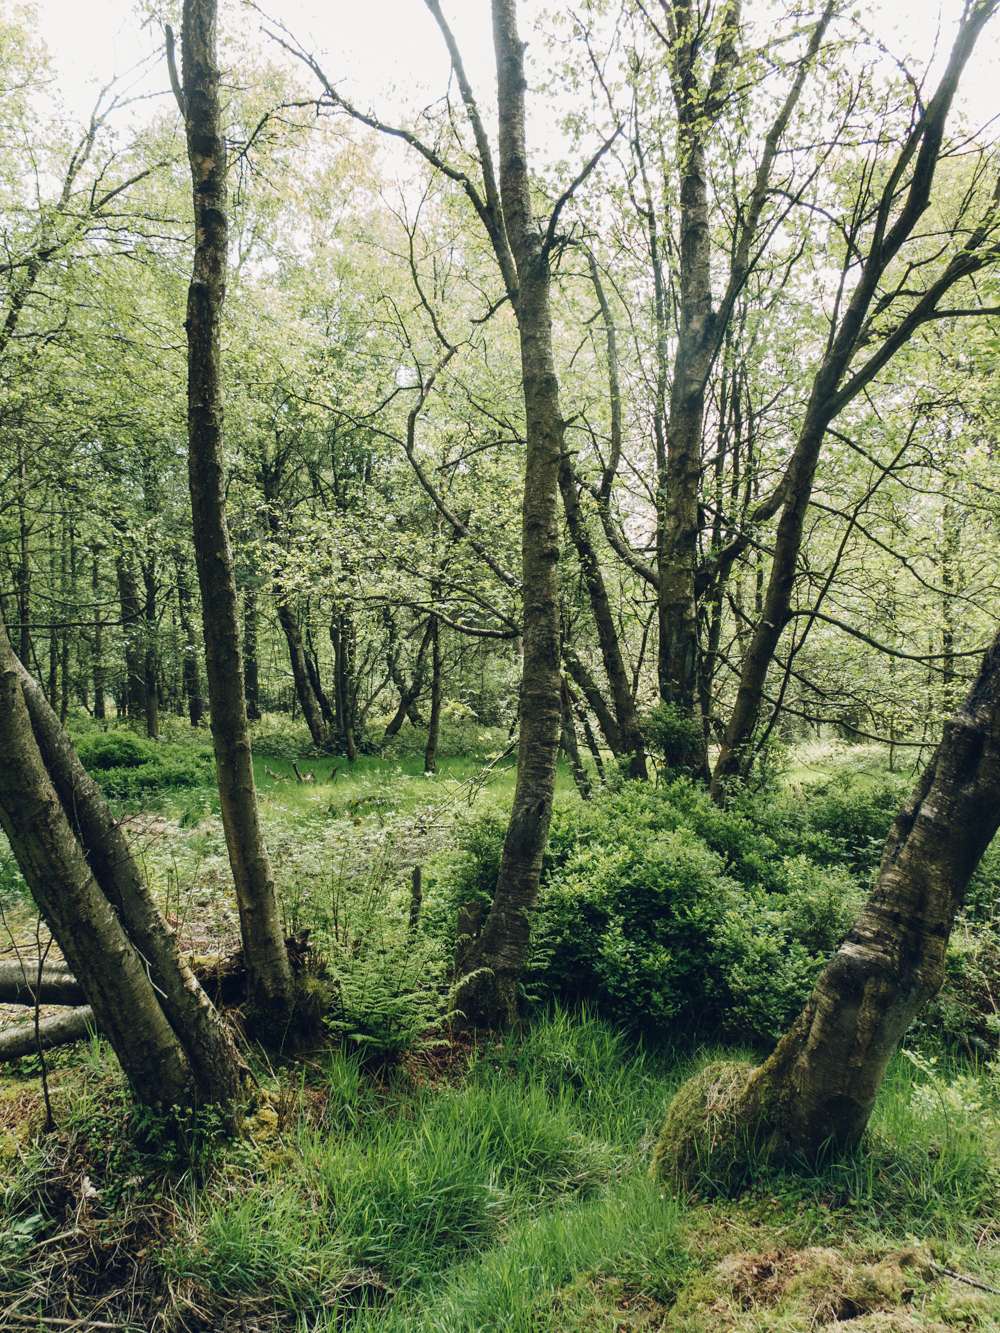 Haarkon Forest Woods Trees Walk Nature Yorkshire Peak District leaf green plants woodland